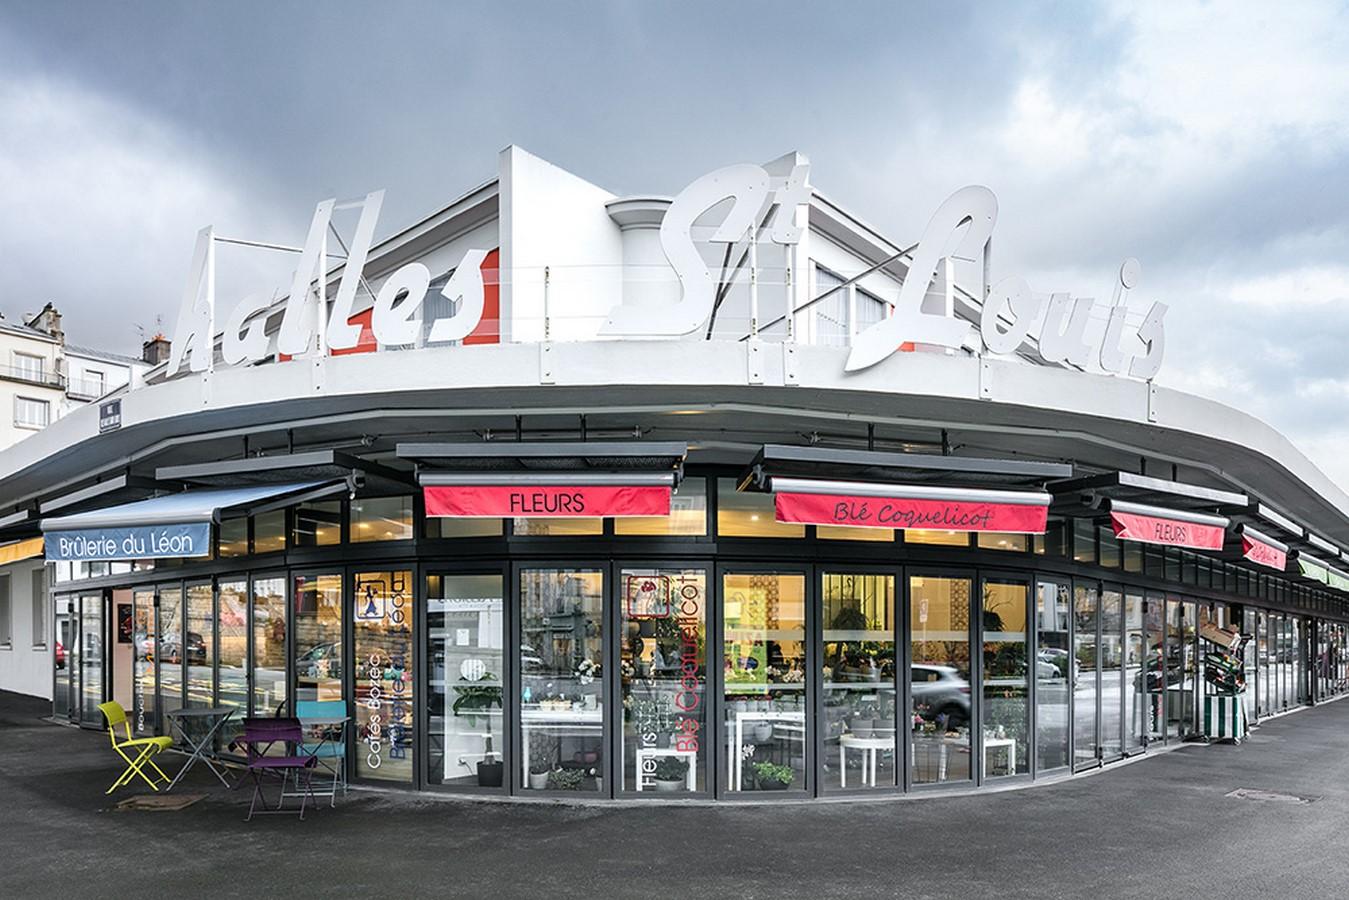 Architects in Brest - Top 30 Architects in Brest - Sheet20